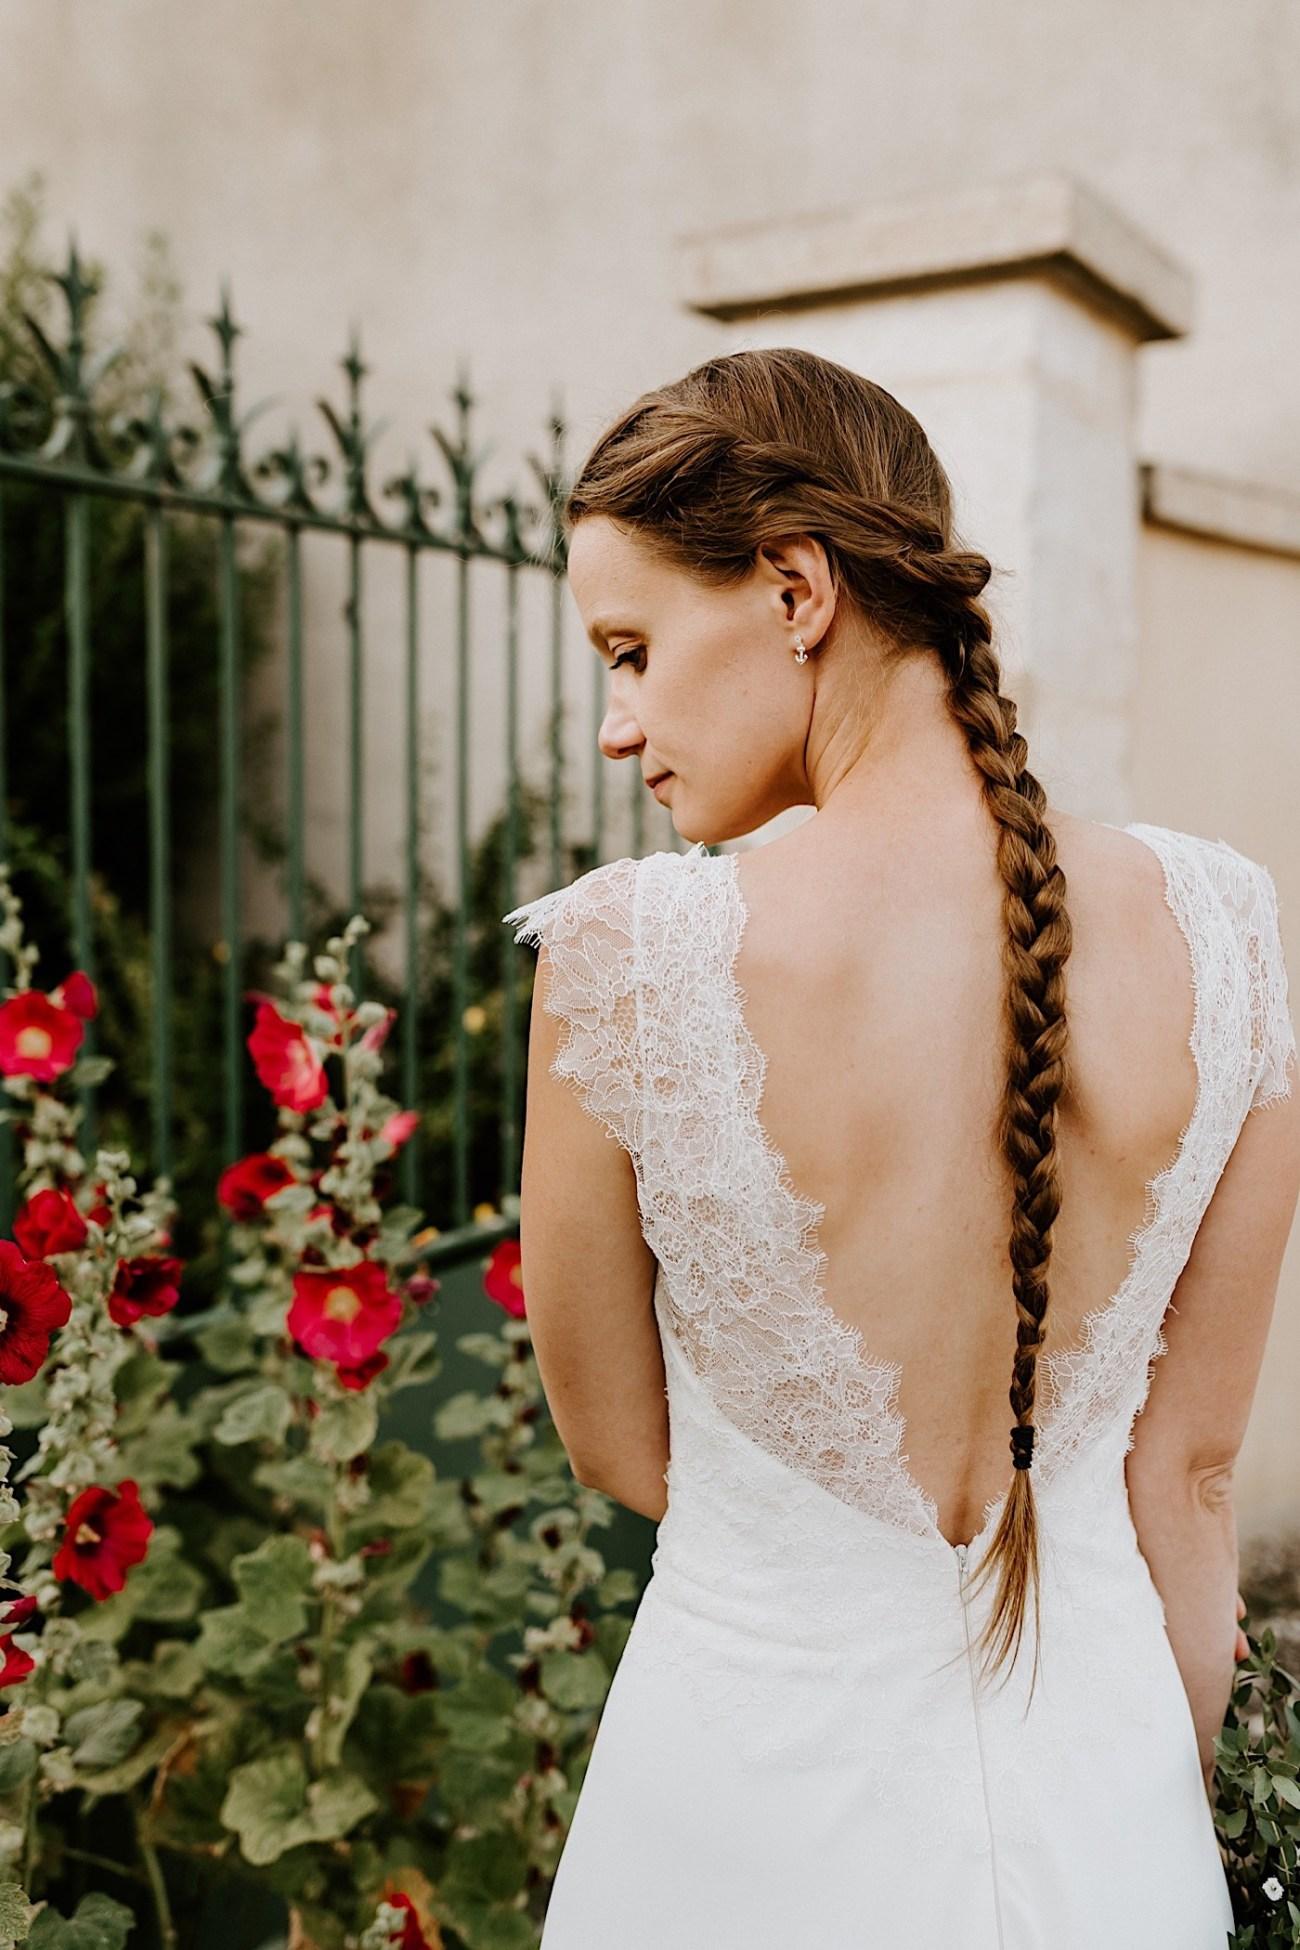 French Rural Wedding After Wedding Day Photos Paris Wedding Photographer 014